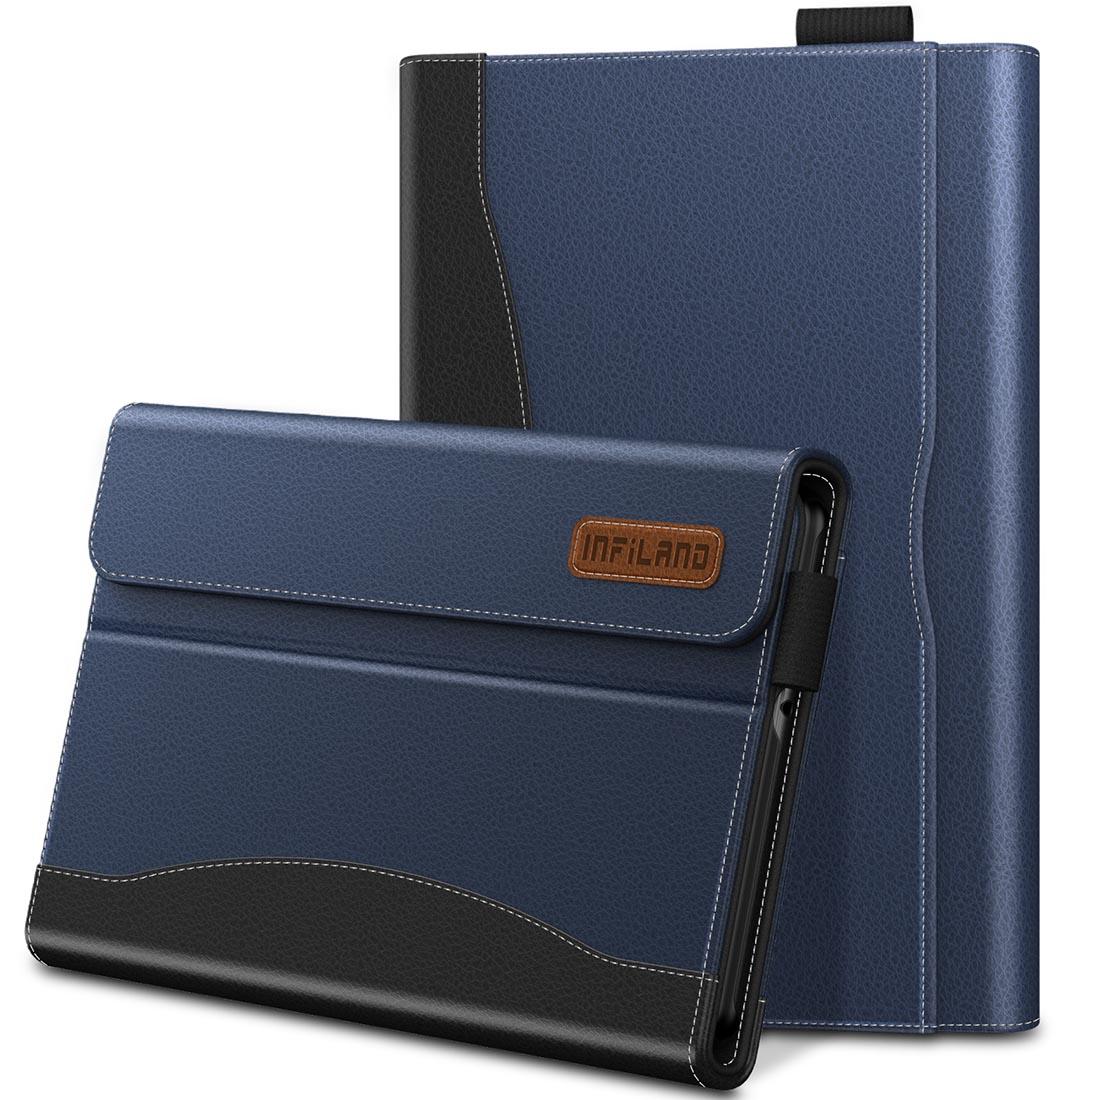 Capa Premium Business Series com Fino Acabamento Galaxy Tab A 2019 8.0 pol T290 T295